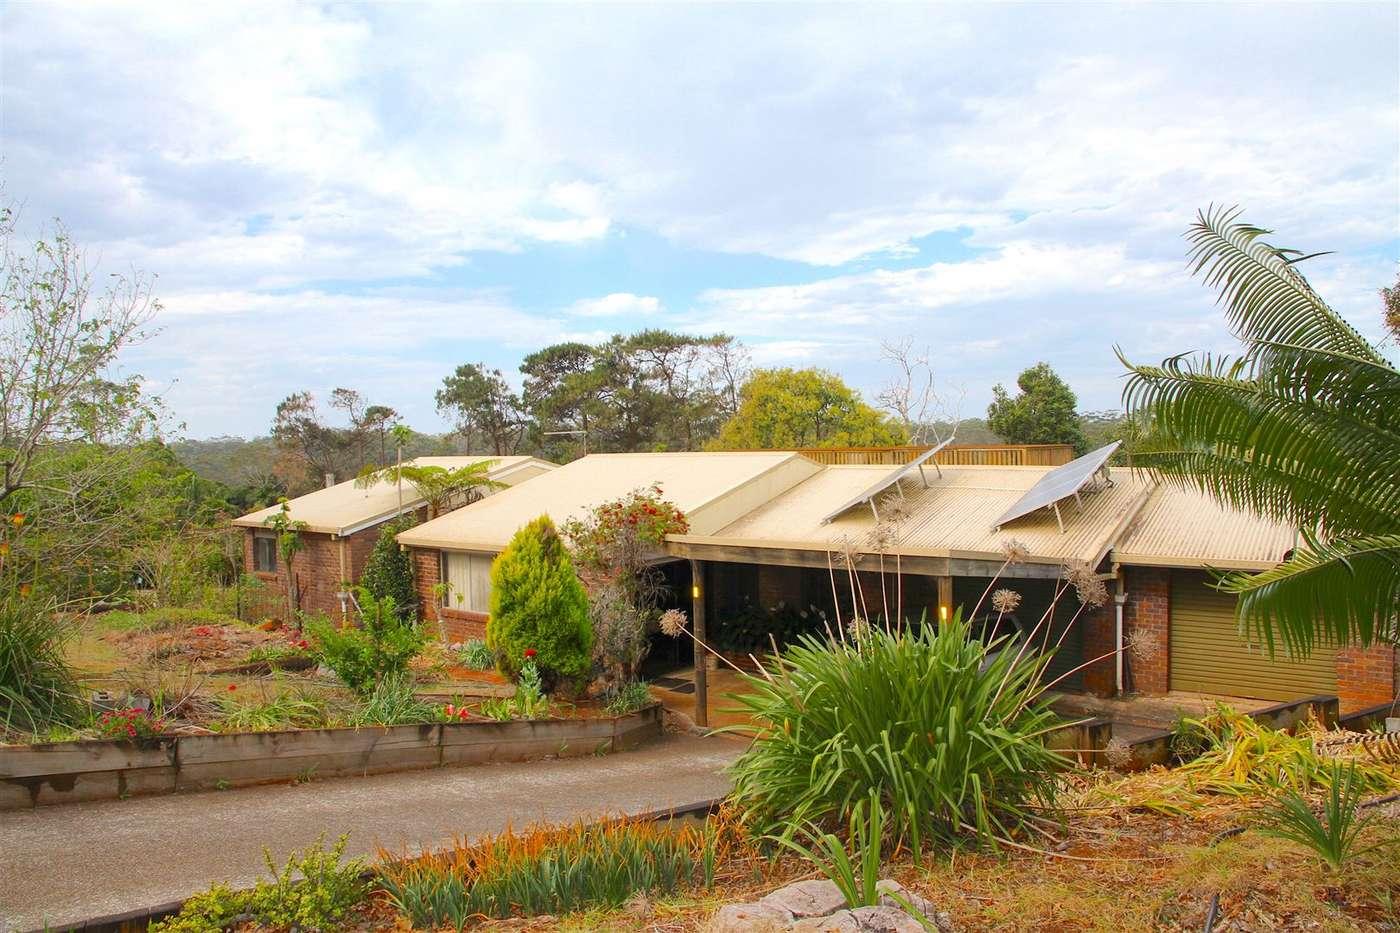 Main view of Homely house listing, 33 Kootenai Drive, Tamborine Mountain, QLD 4272